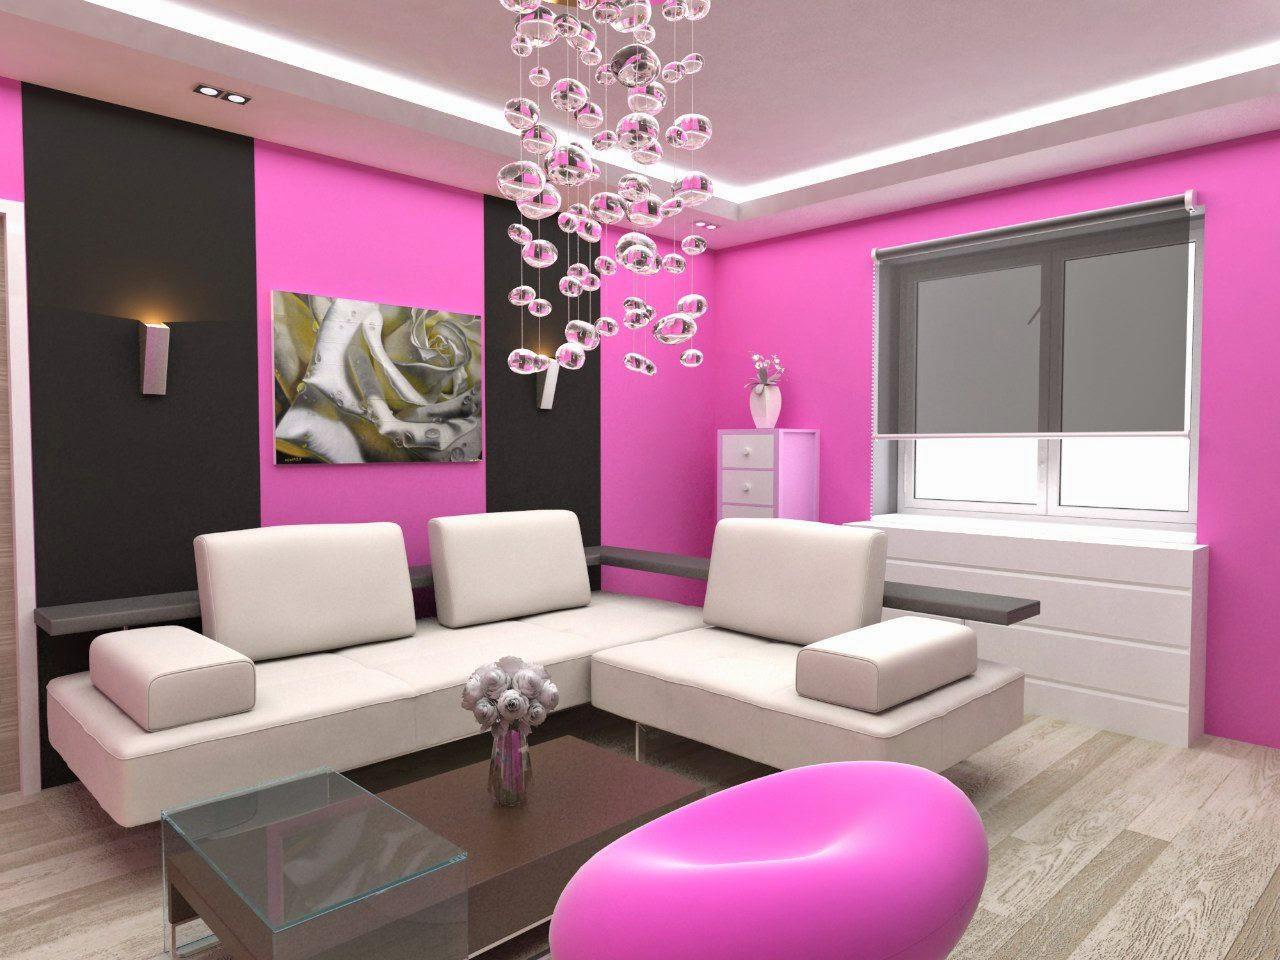 Celebrity Homes: Let\'s explore cute Pink living room Decor ideas